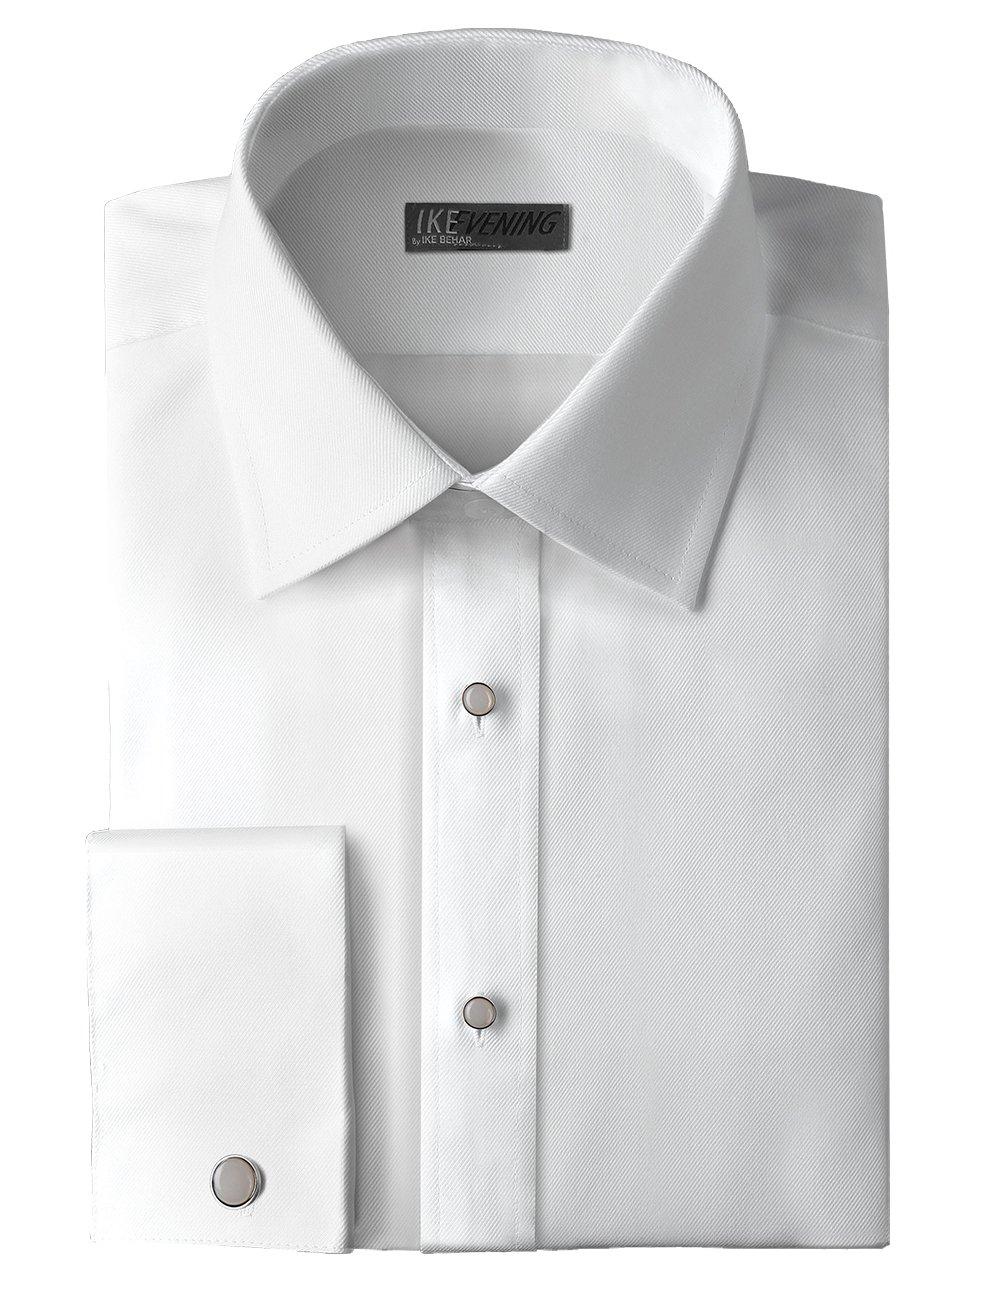 Ike Behar Traditional Fit 100% Woven Cotton Tuxedo Dress Shirt by Ike Behar